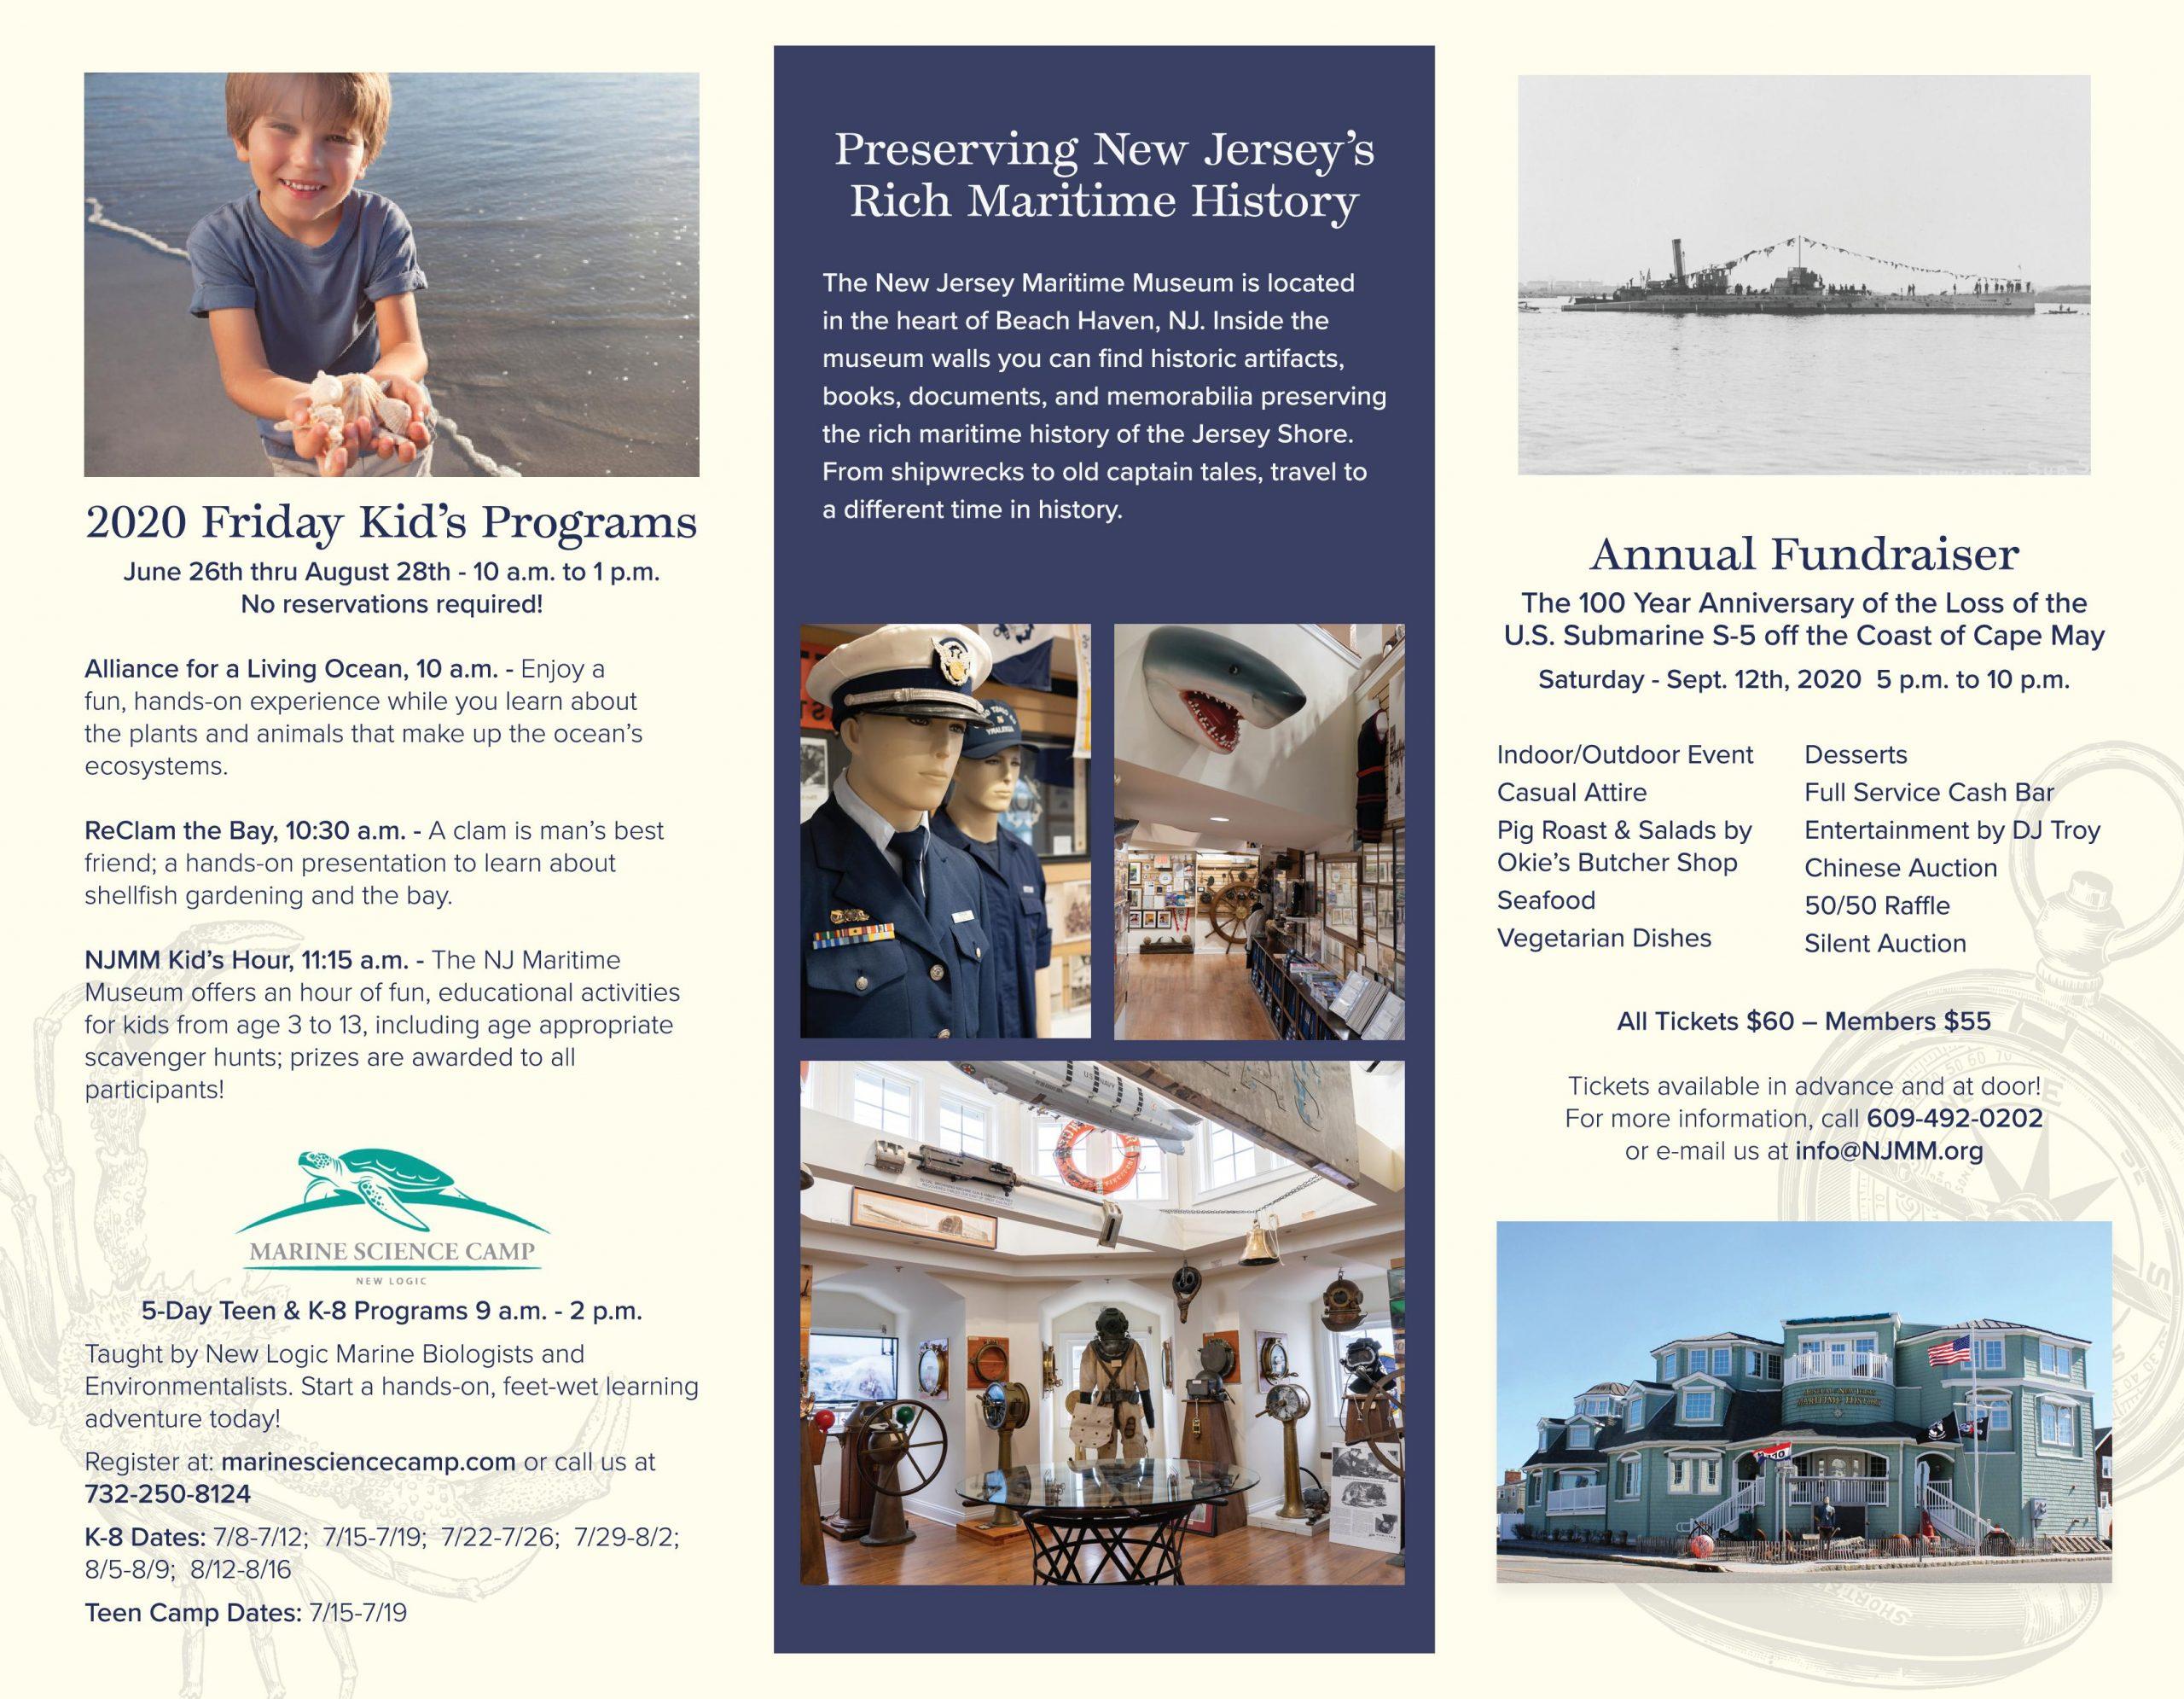 2020 Nj Maritime Museum Brochure - New Jersey Maritime Museum Intended For Order Wildwood Nj Usa Tourist Brochure